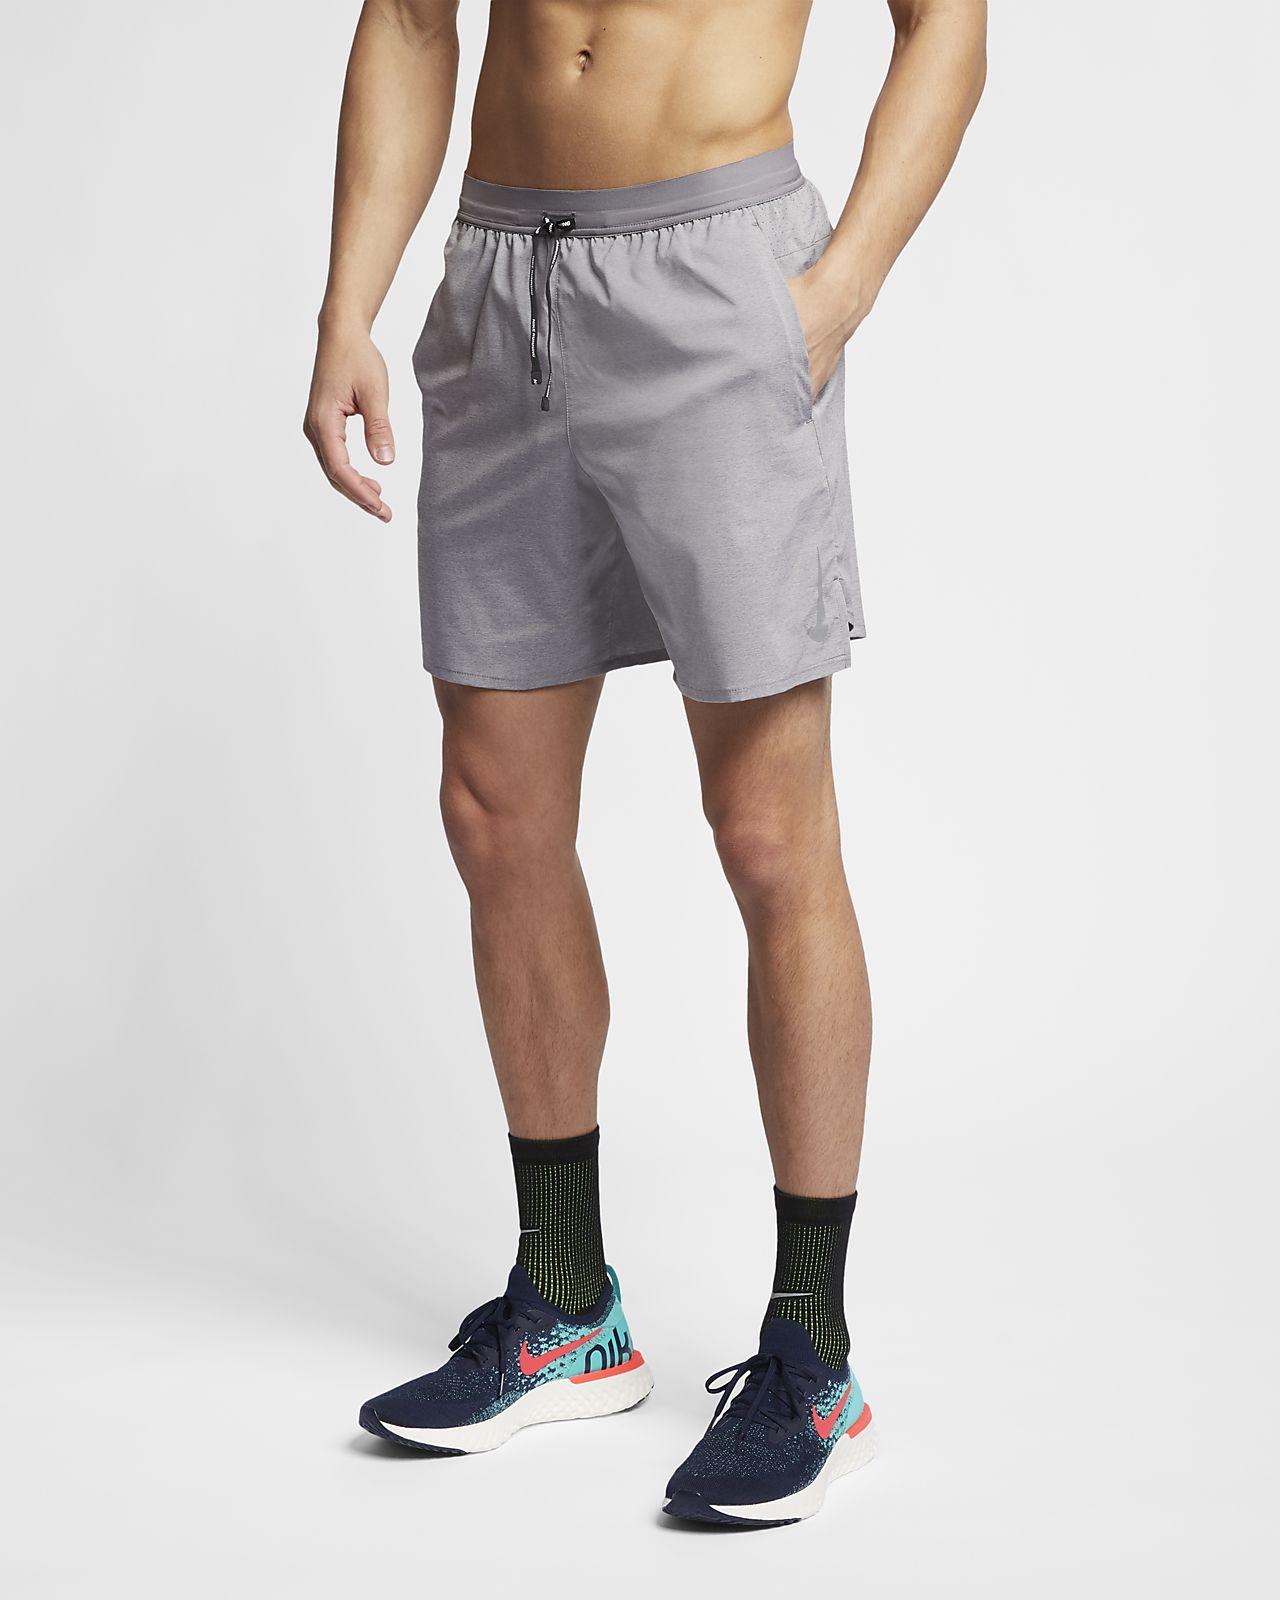 Nike Dri-FIT Flex Stride 18 cm 2'si 1 Arada Erkek Koşu Şortu